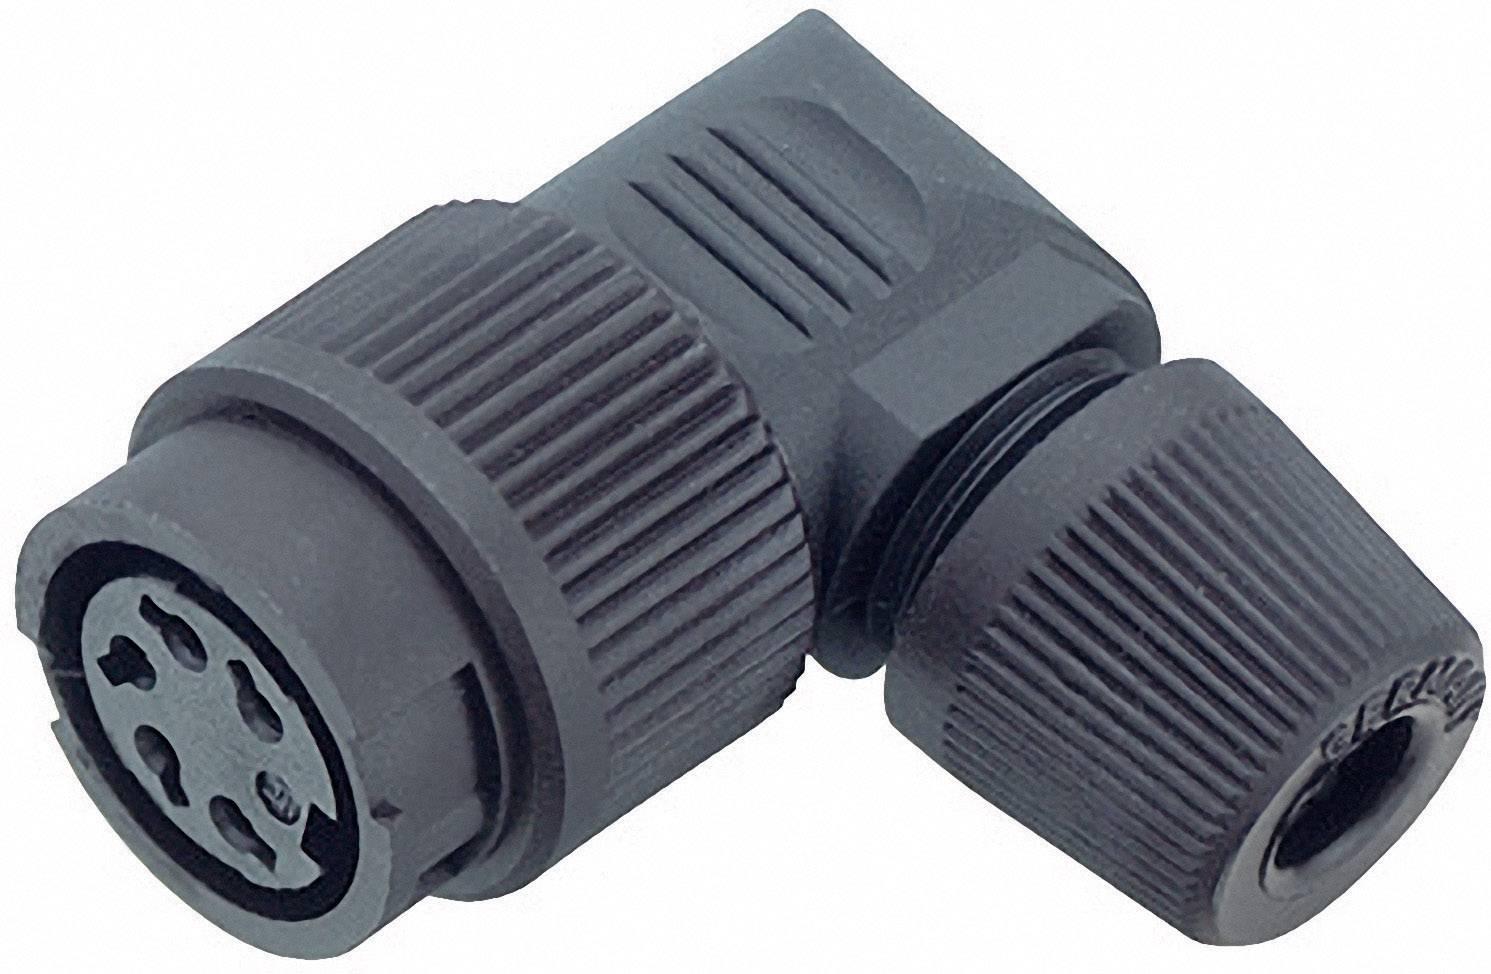 Kabelový konektor Binder 99-0622-70-07, 7pól., 0.75 mm², 4 - 6 mm, IP40, černá